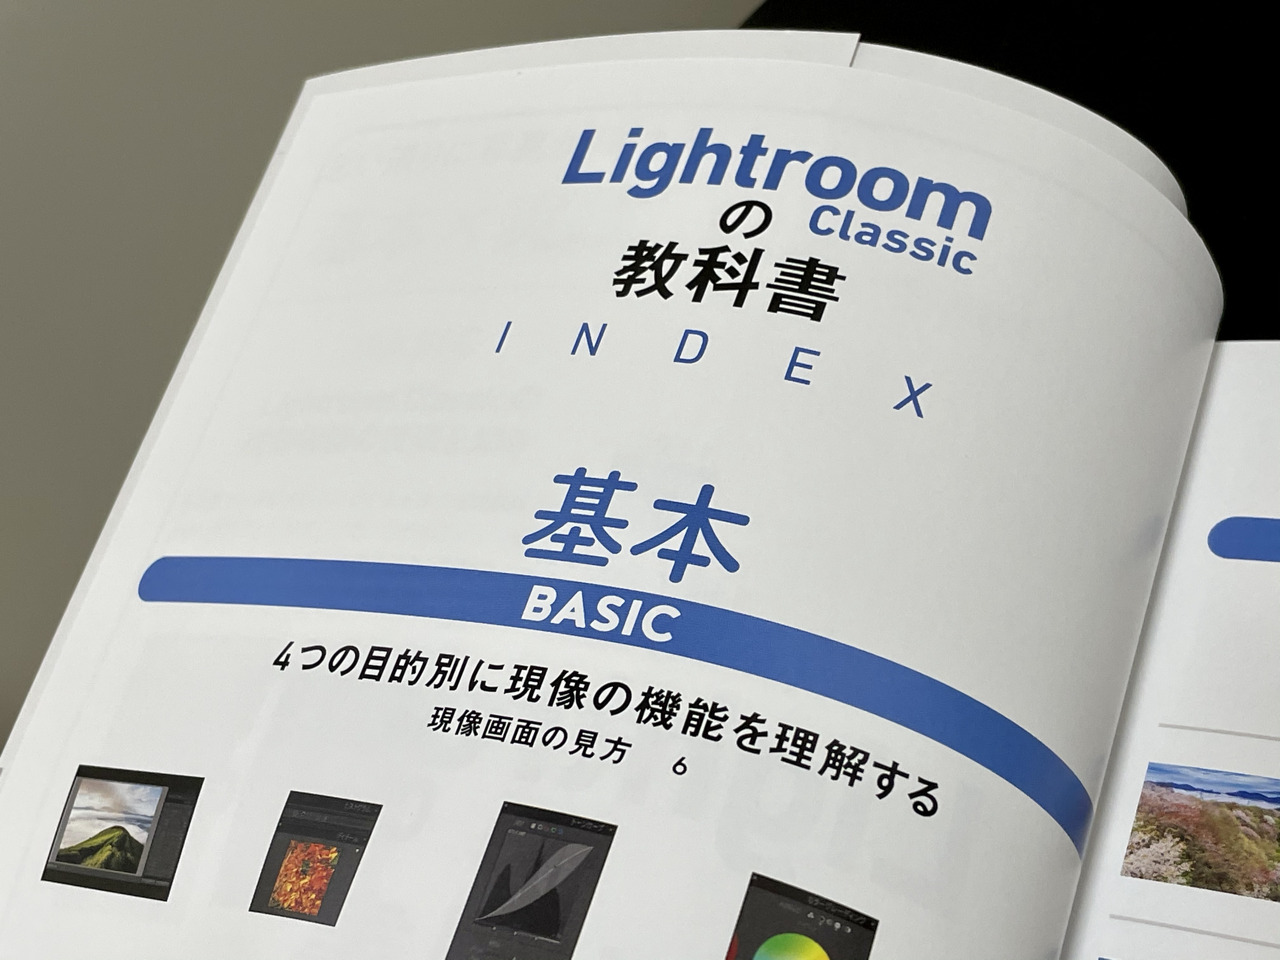 Lightroomの教科書目次